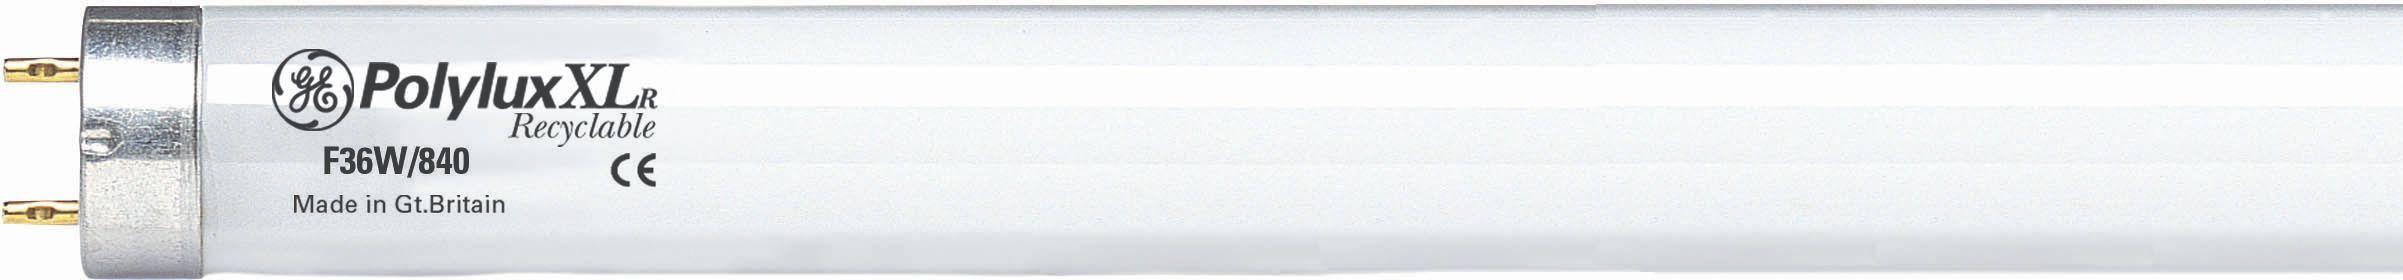 GE Lysrør fullfarge 18W/830 Varmhv 600mm 93319